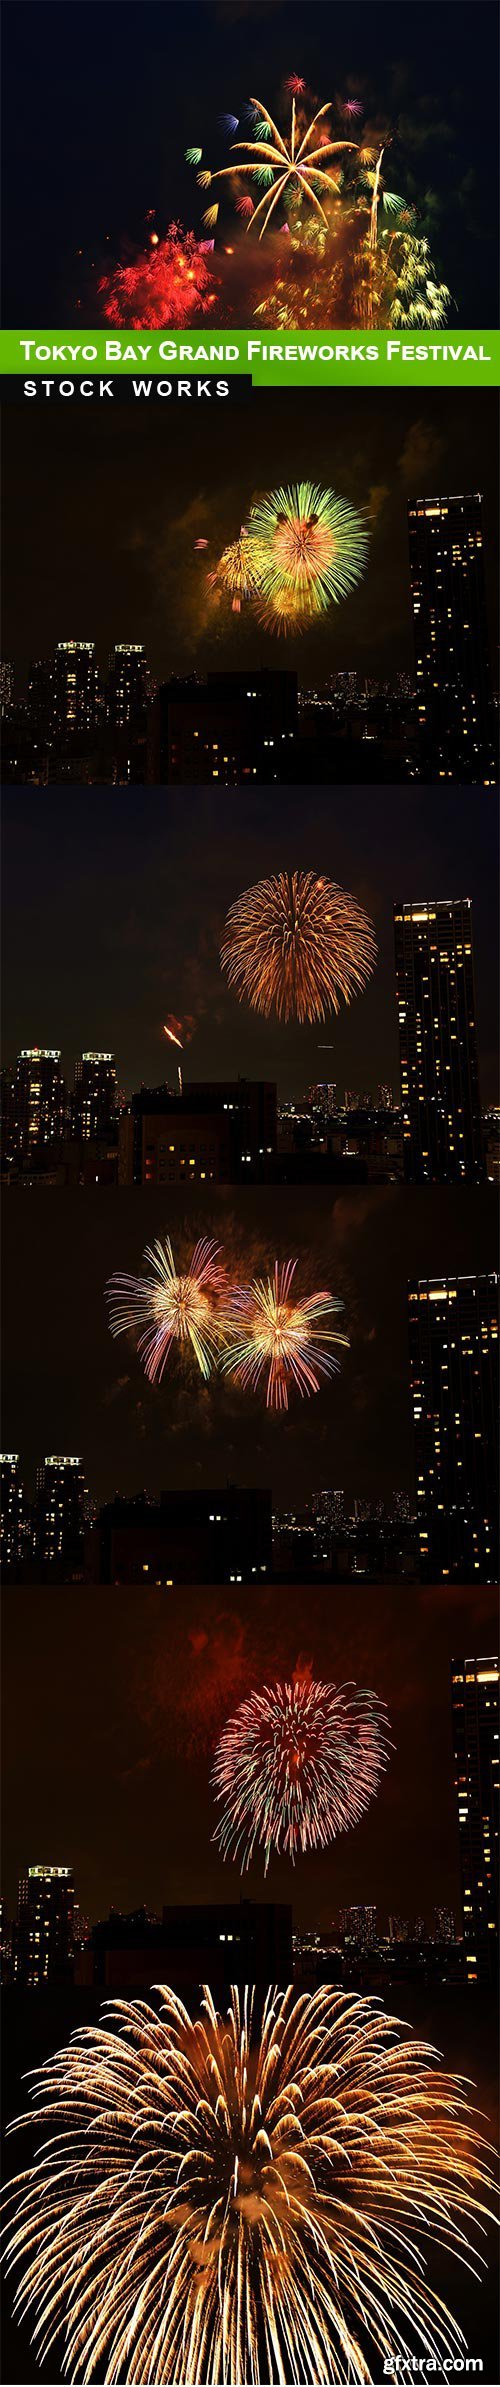 Tokyo Bay Grand Fireworks Festival - 6 UHQ JPEG